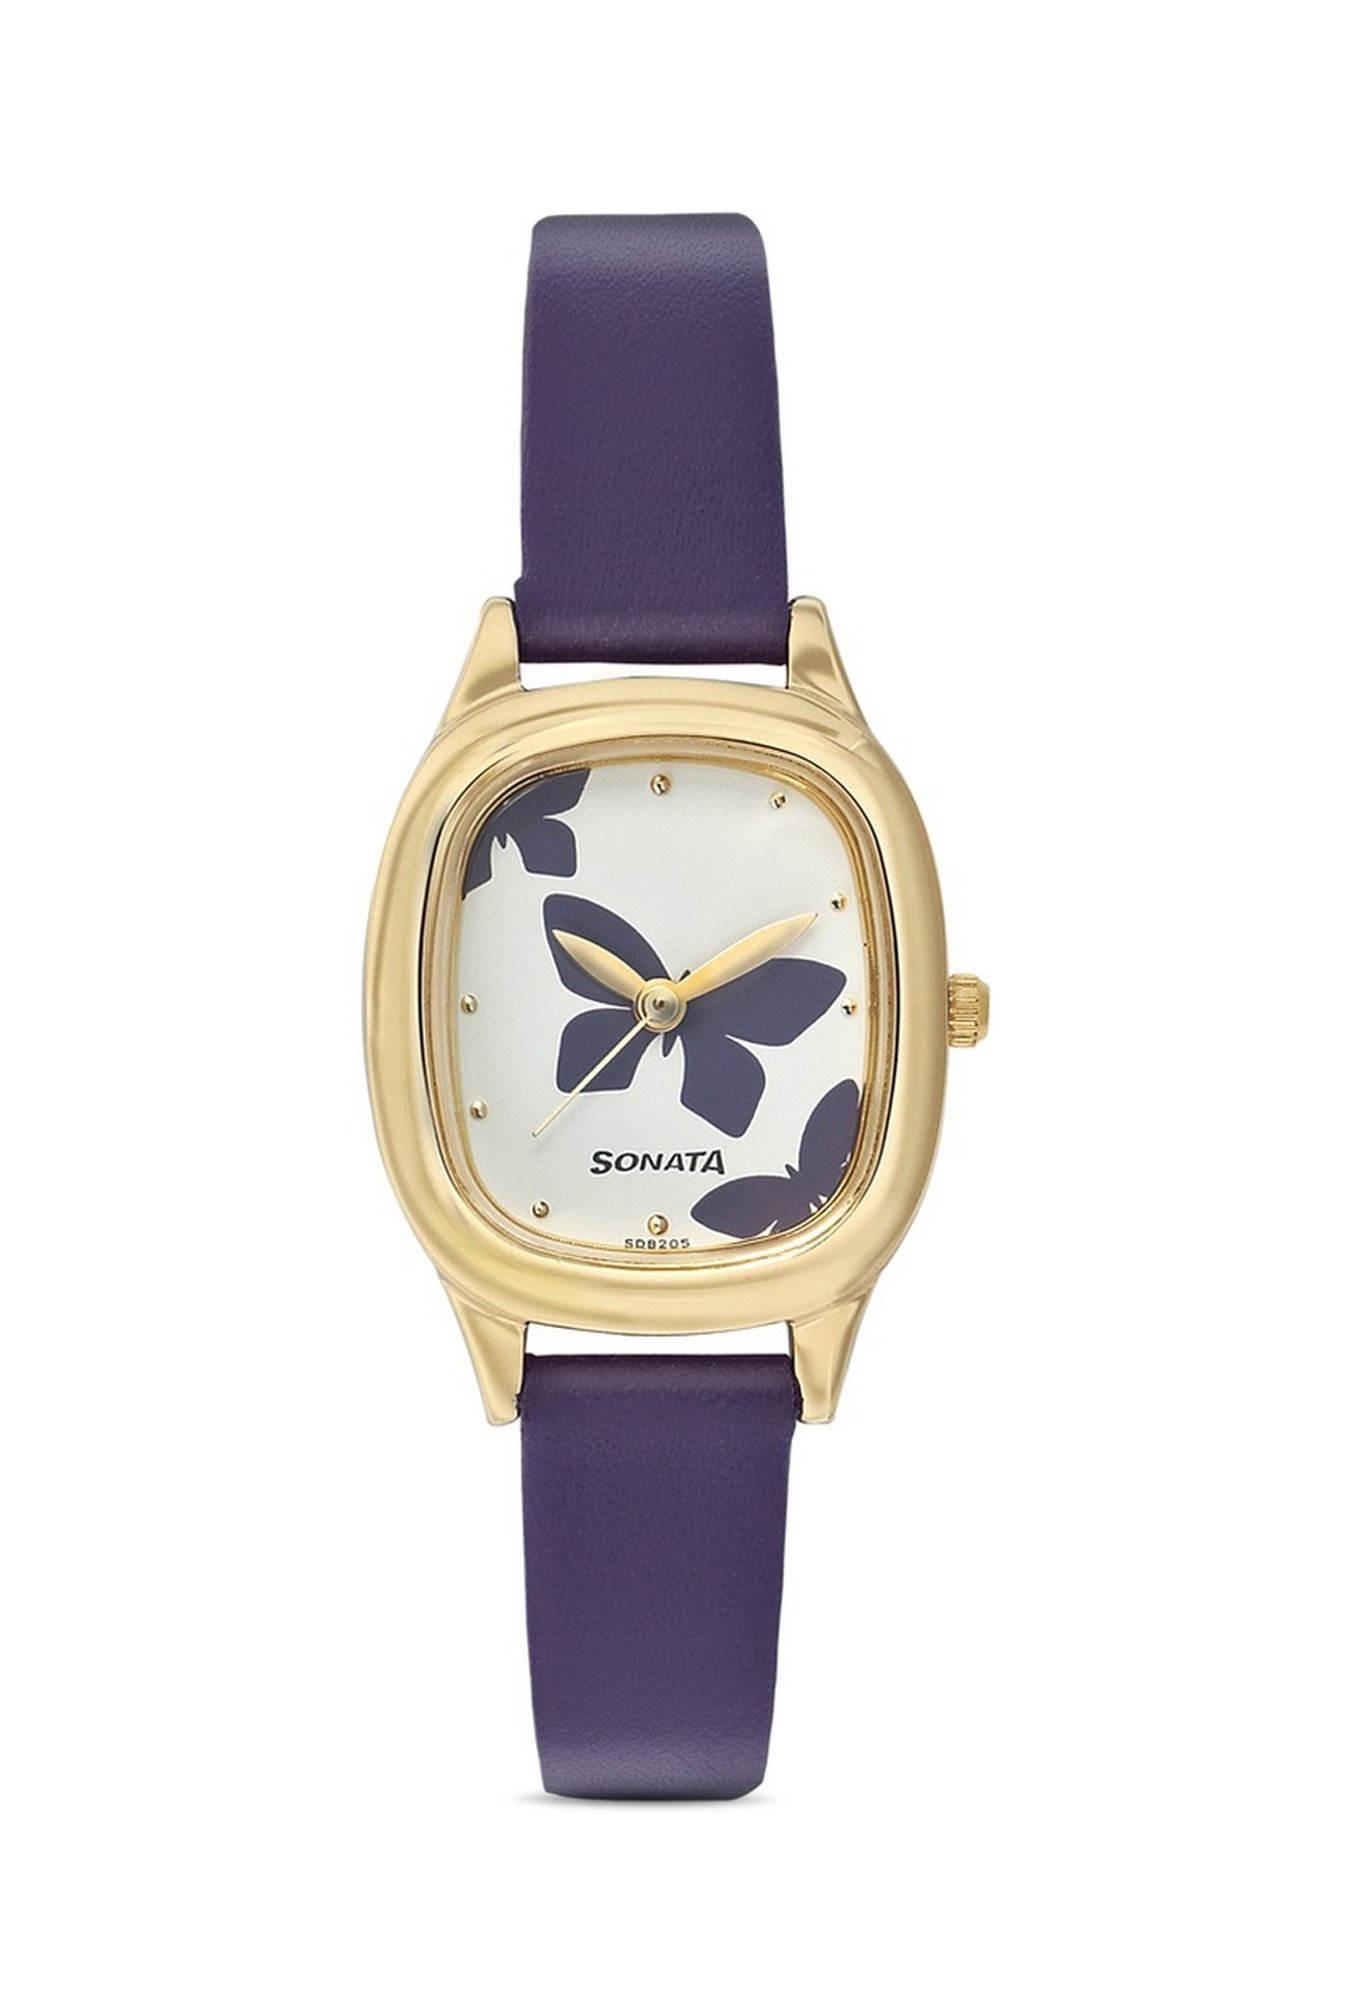 Sonata NG8060YL01C Analog Yoga Gold White Dial Women's Watch (NG8060YL01C)